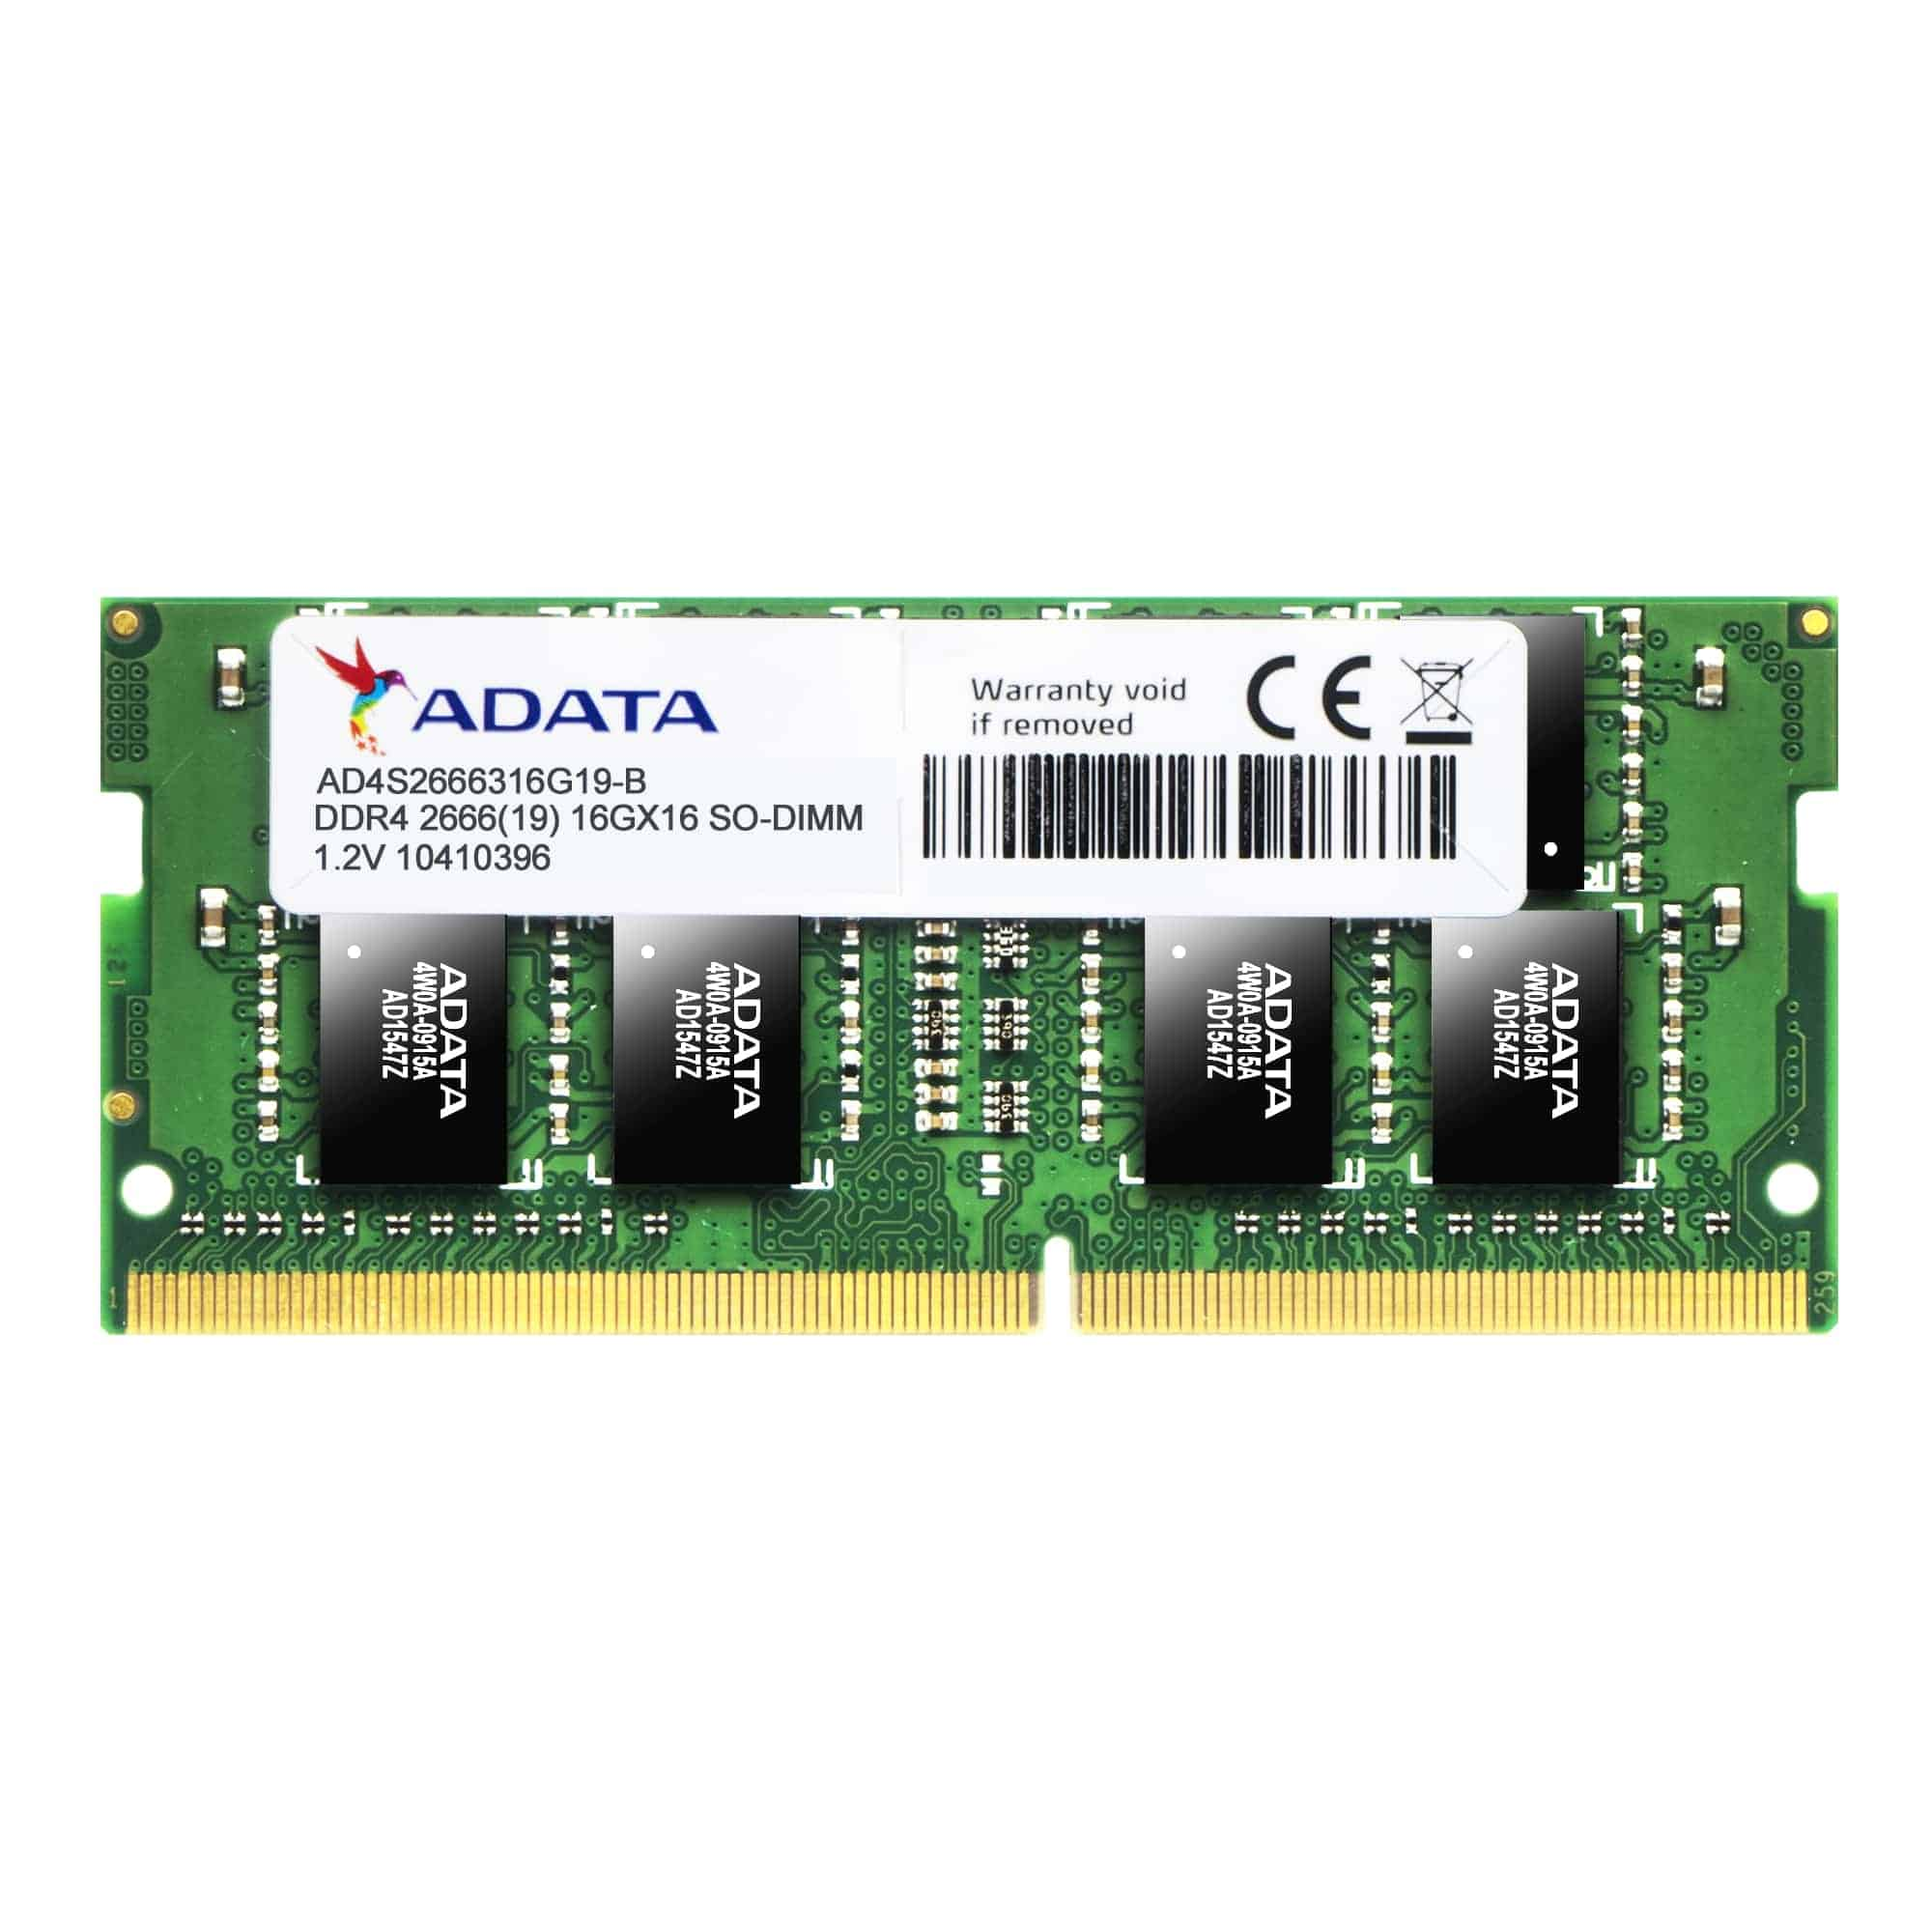 ADATA 8GB 2666Mhz PC4-21300 DDR4 CL19 SO-DIMM